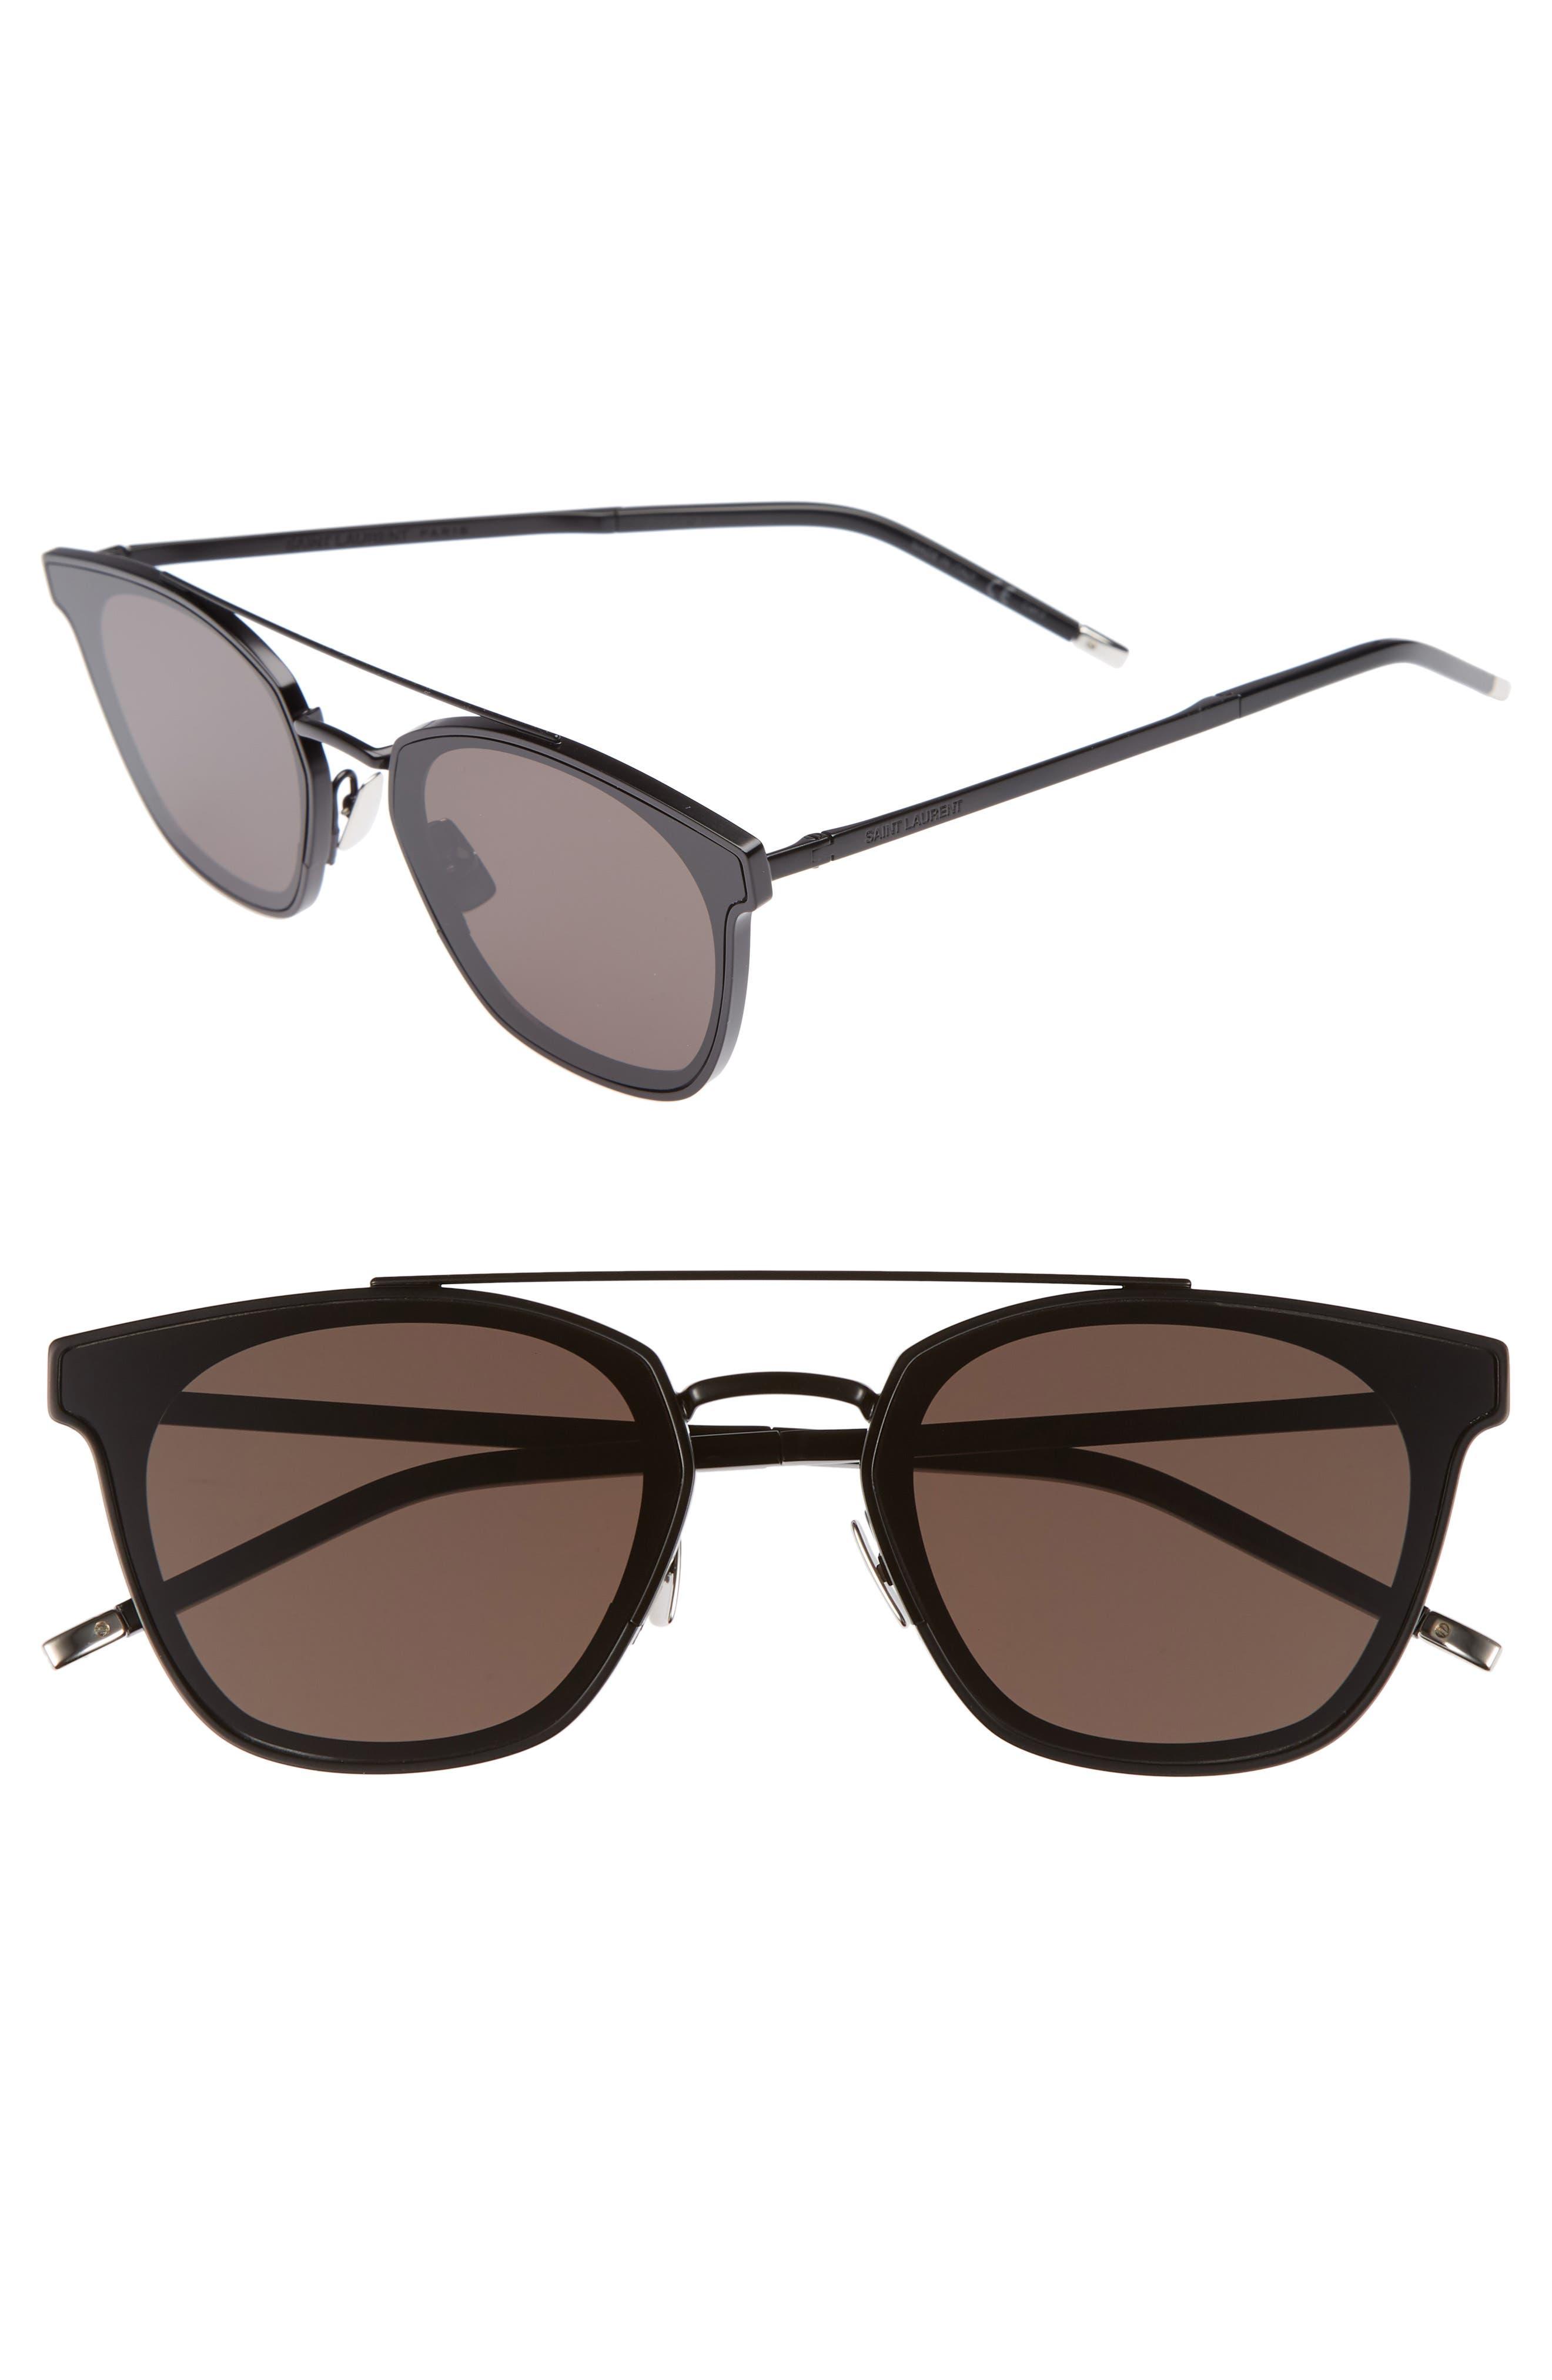 Main Image - Saint Laurent SL 28 61mm Polarized Sunglasses